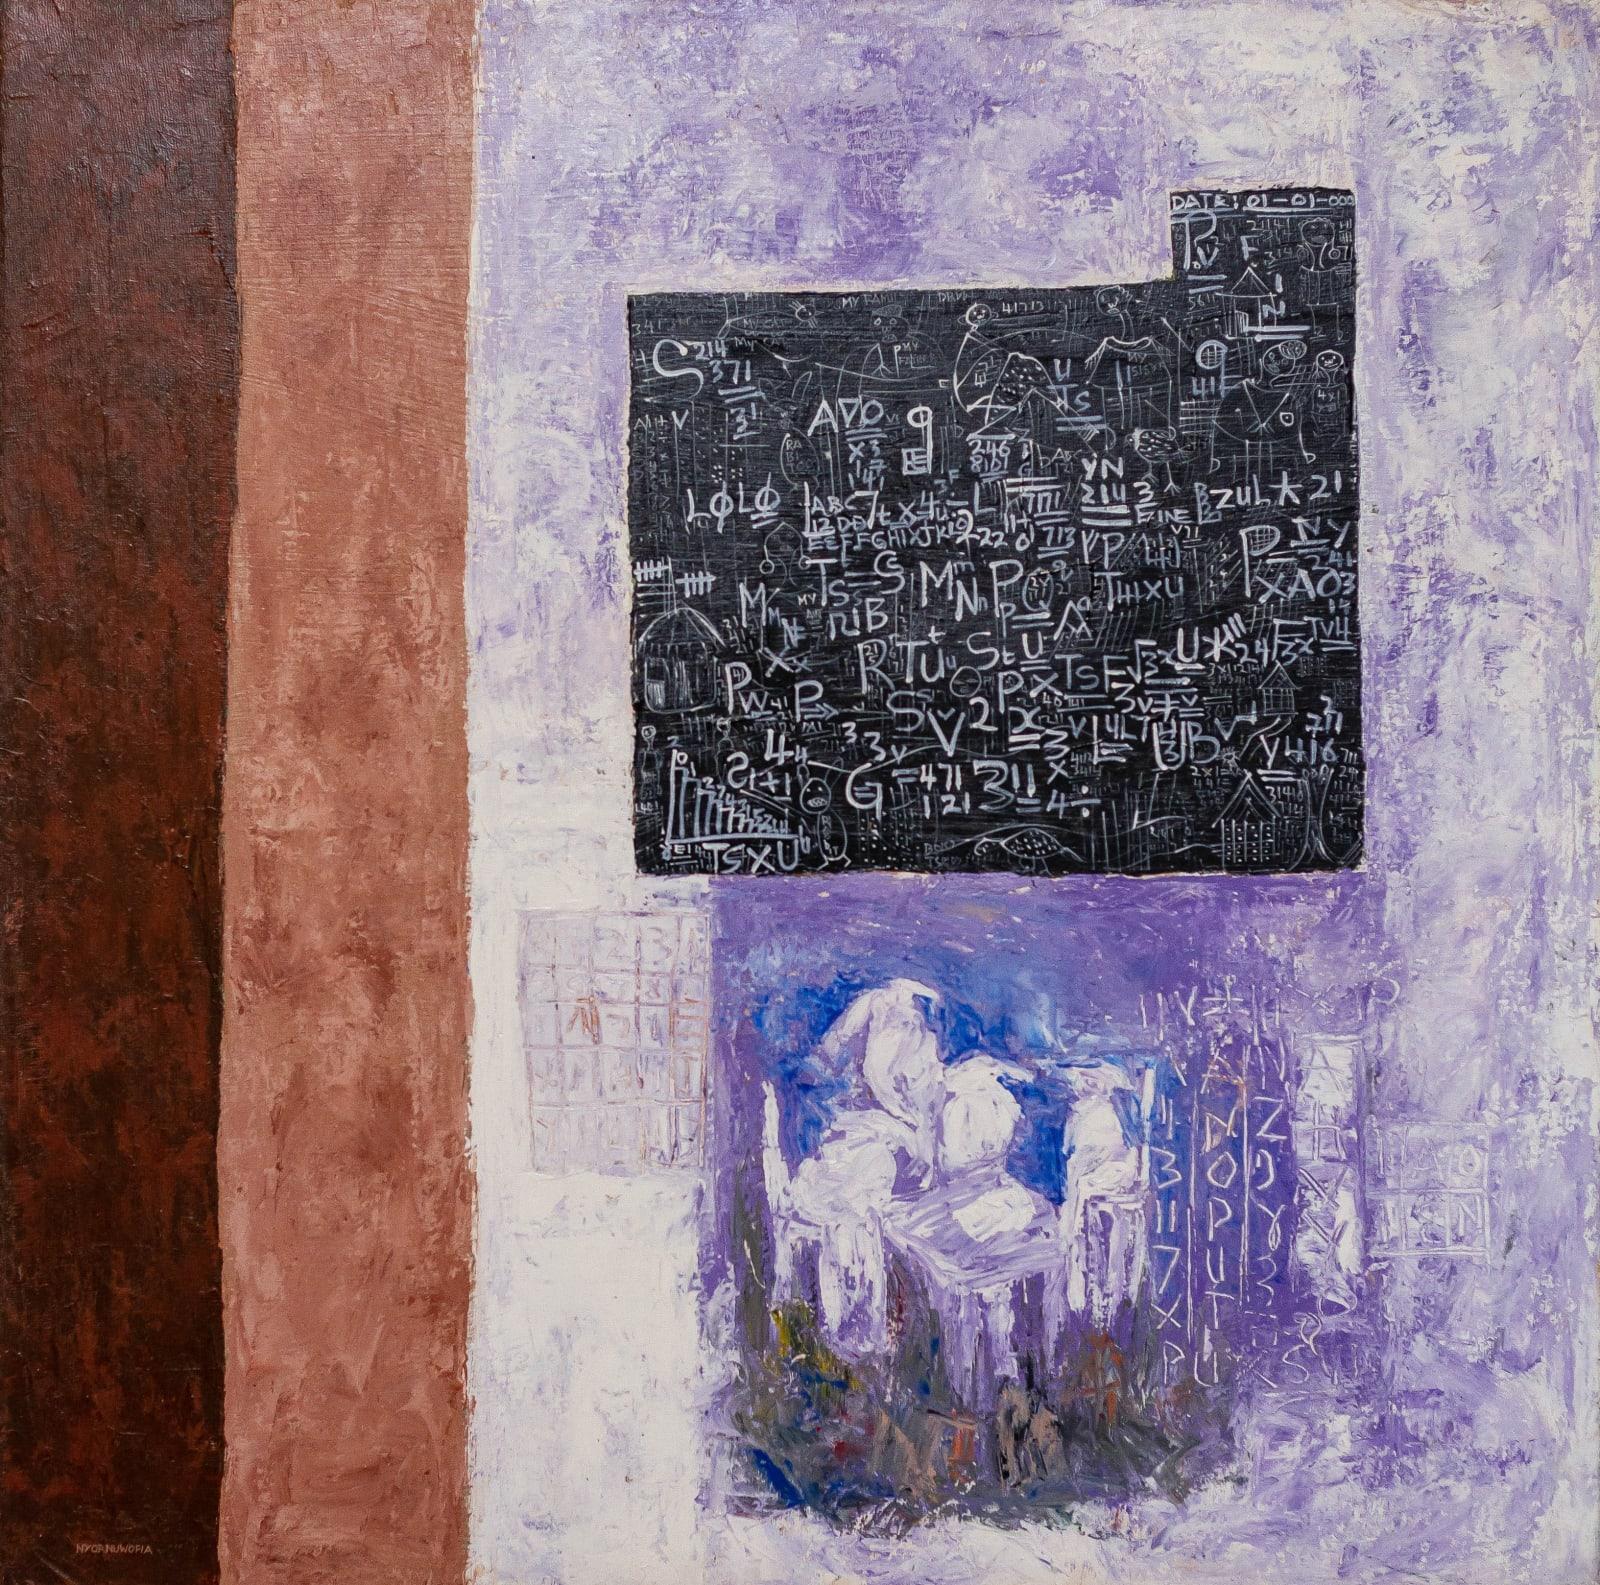 Nyornuwofia Agorsor The Invention hall (2015) 100 x 100 cm Acrylic on canvas